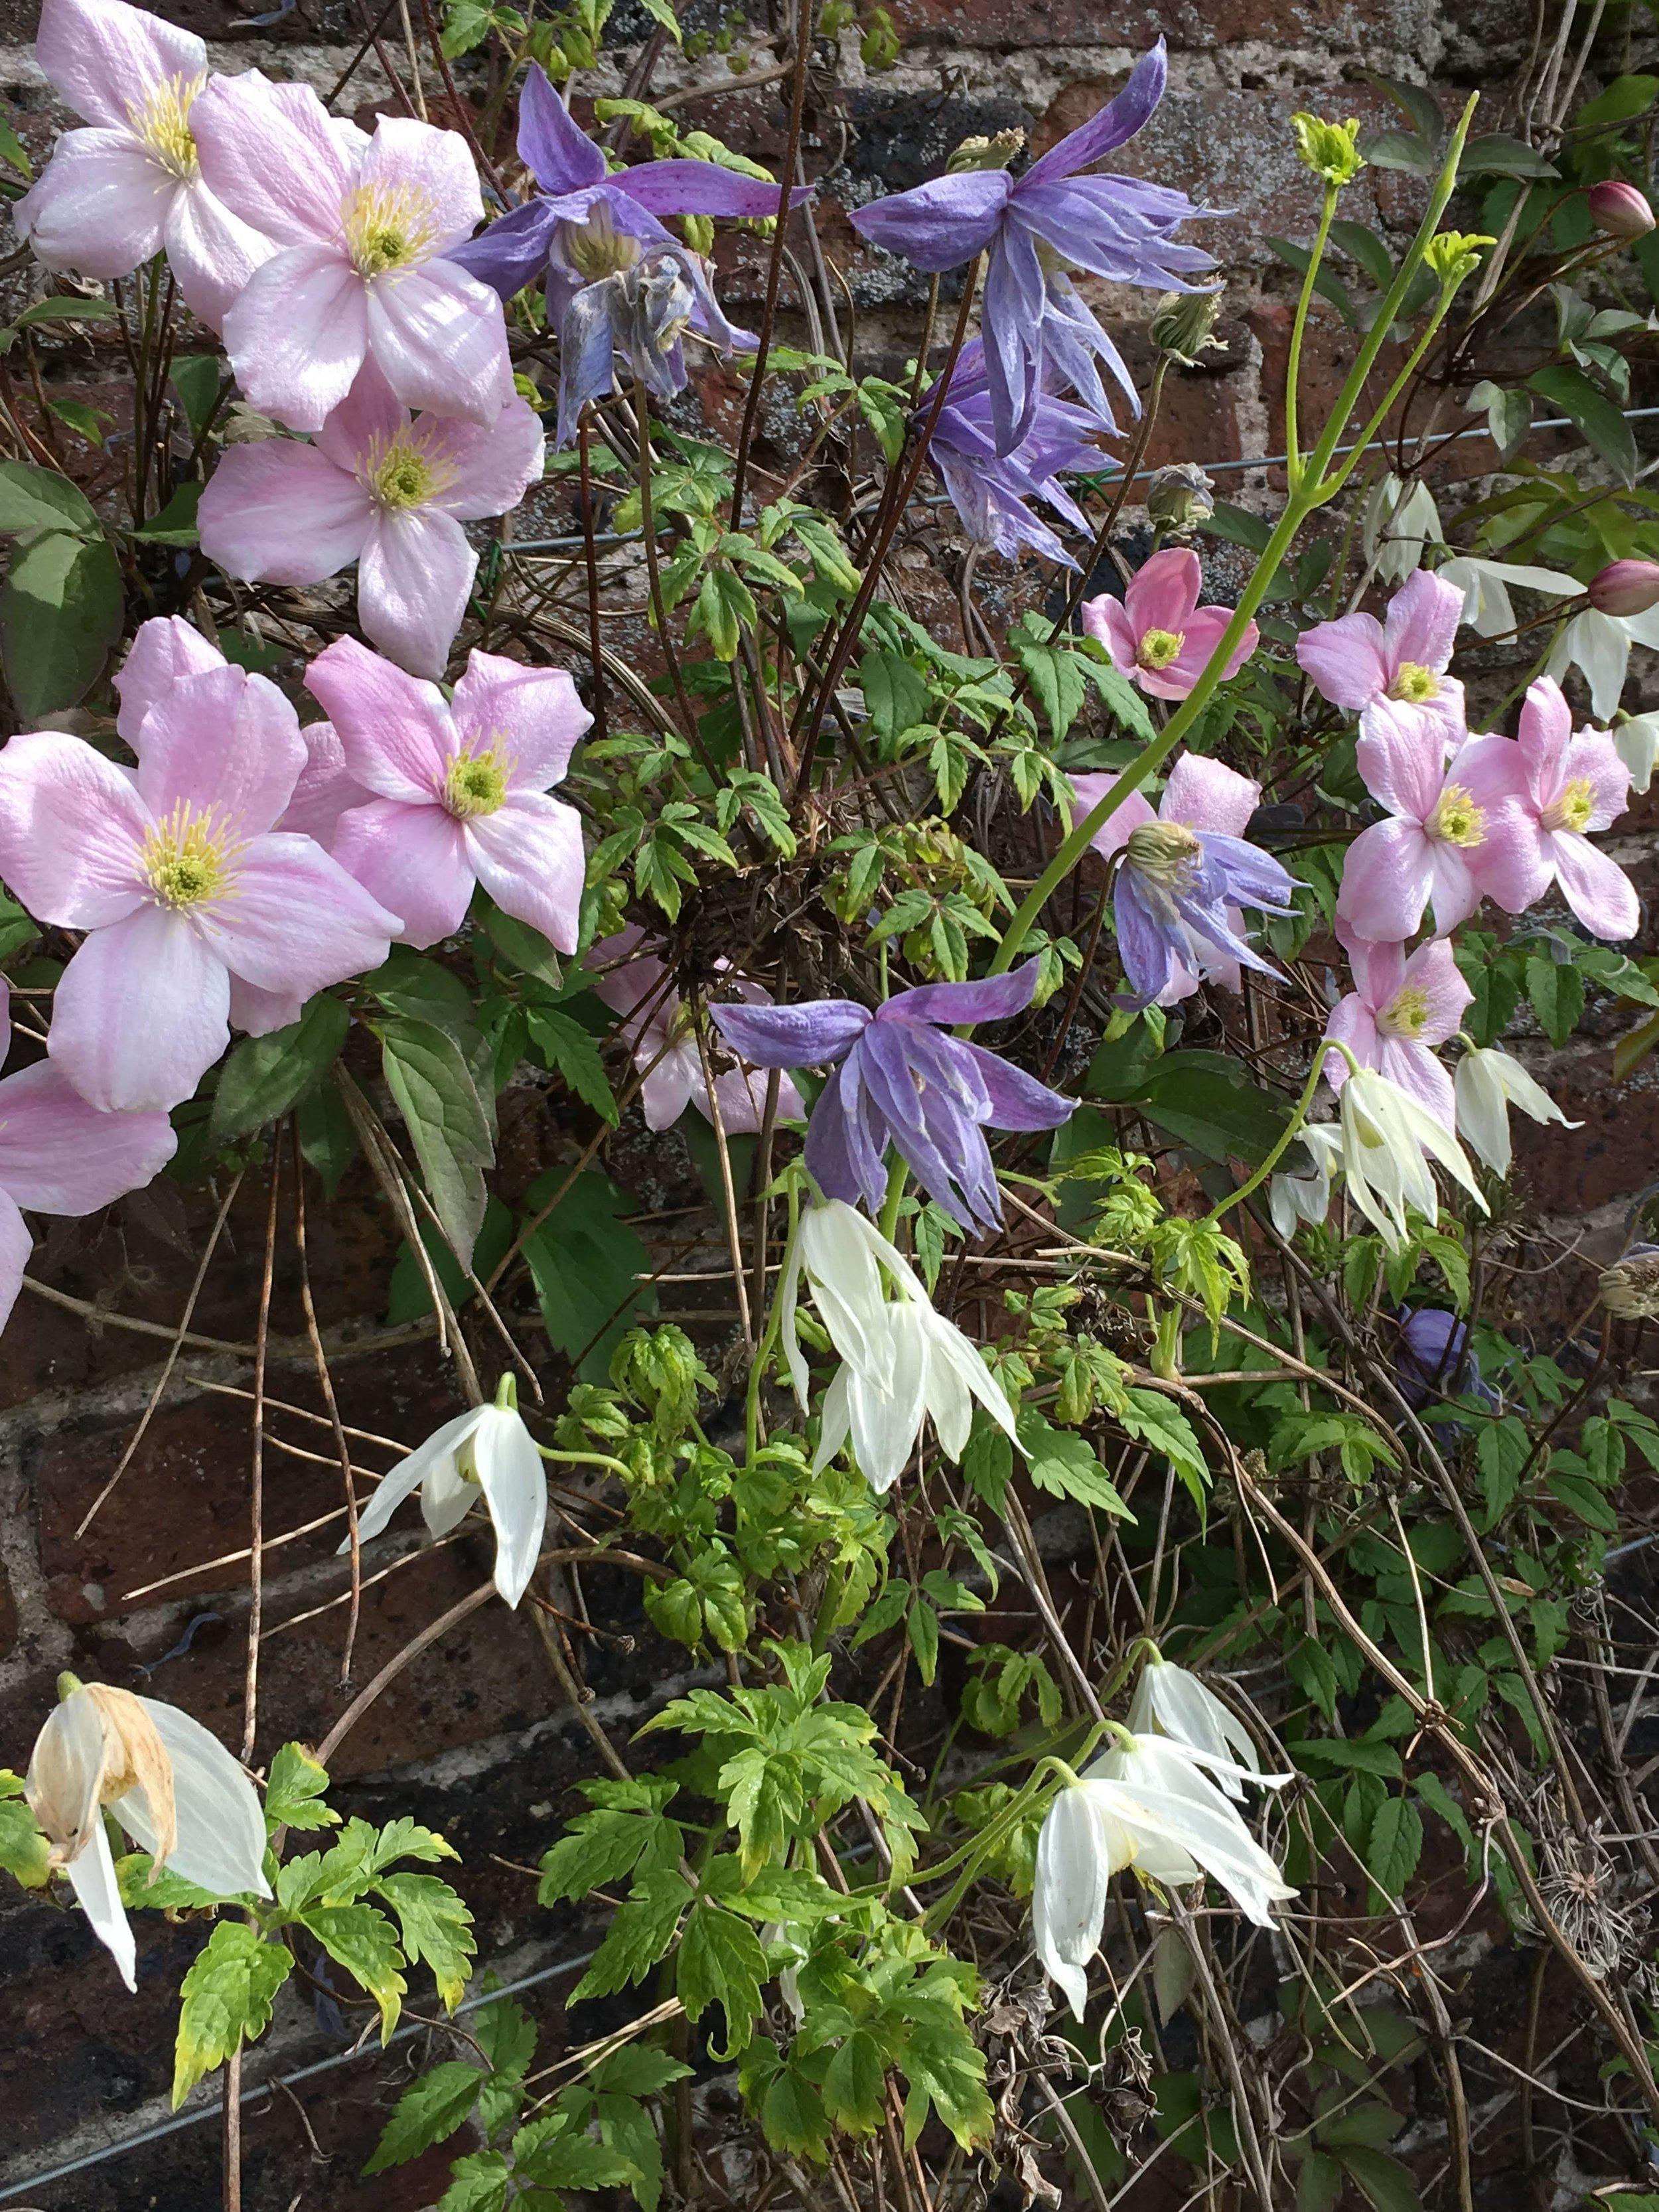 Clematis montana 'Elizabeth' 'Alpina Blue' & 'White Columbine'